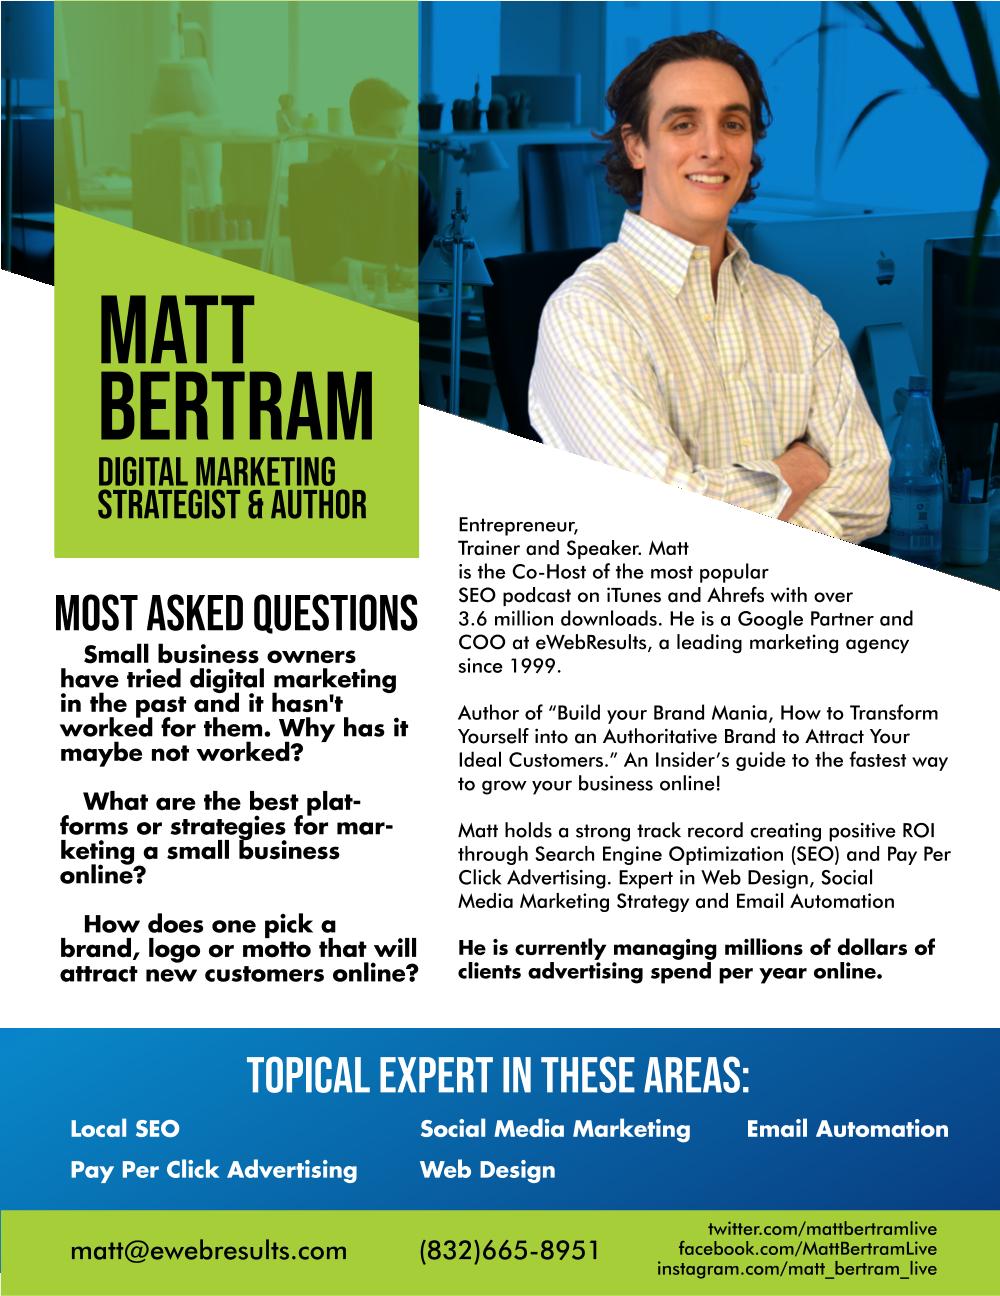 Matt Bertram, Digital Marketing SEO Expert & Author - Radio Guest